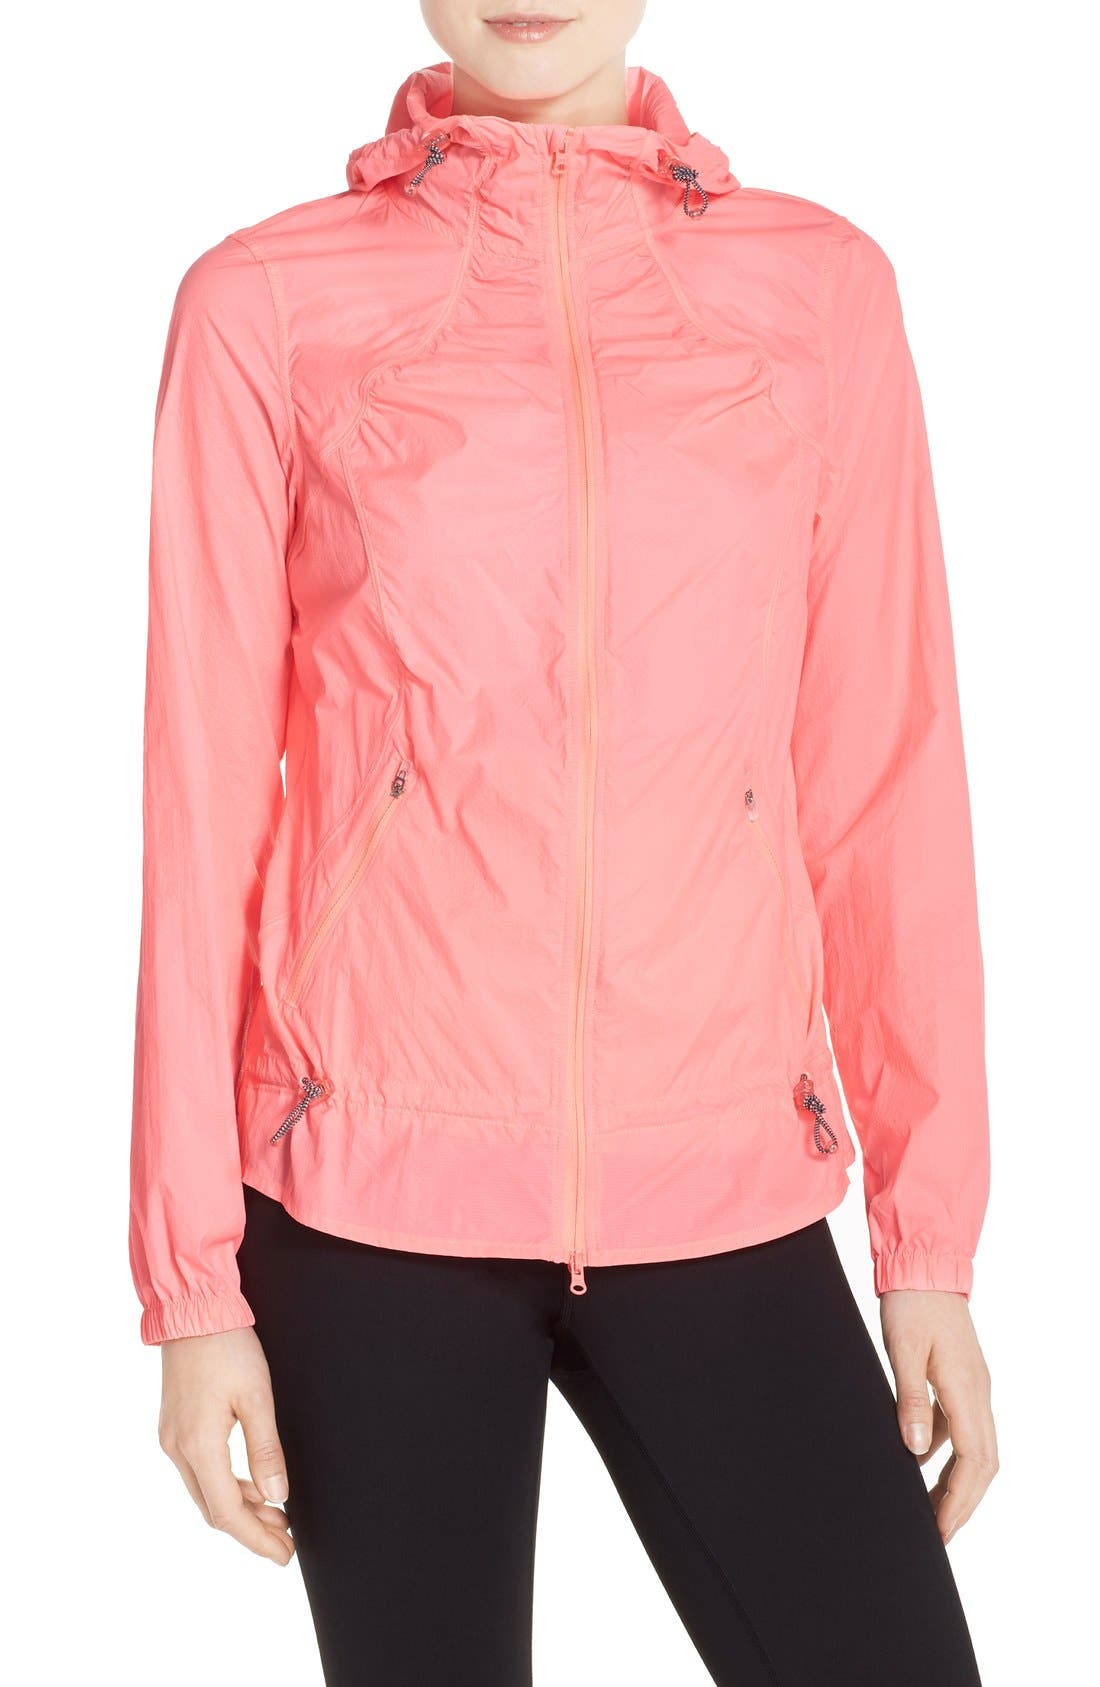 Main Image - Zella 'Euphoria' Windbreaker Jacket